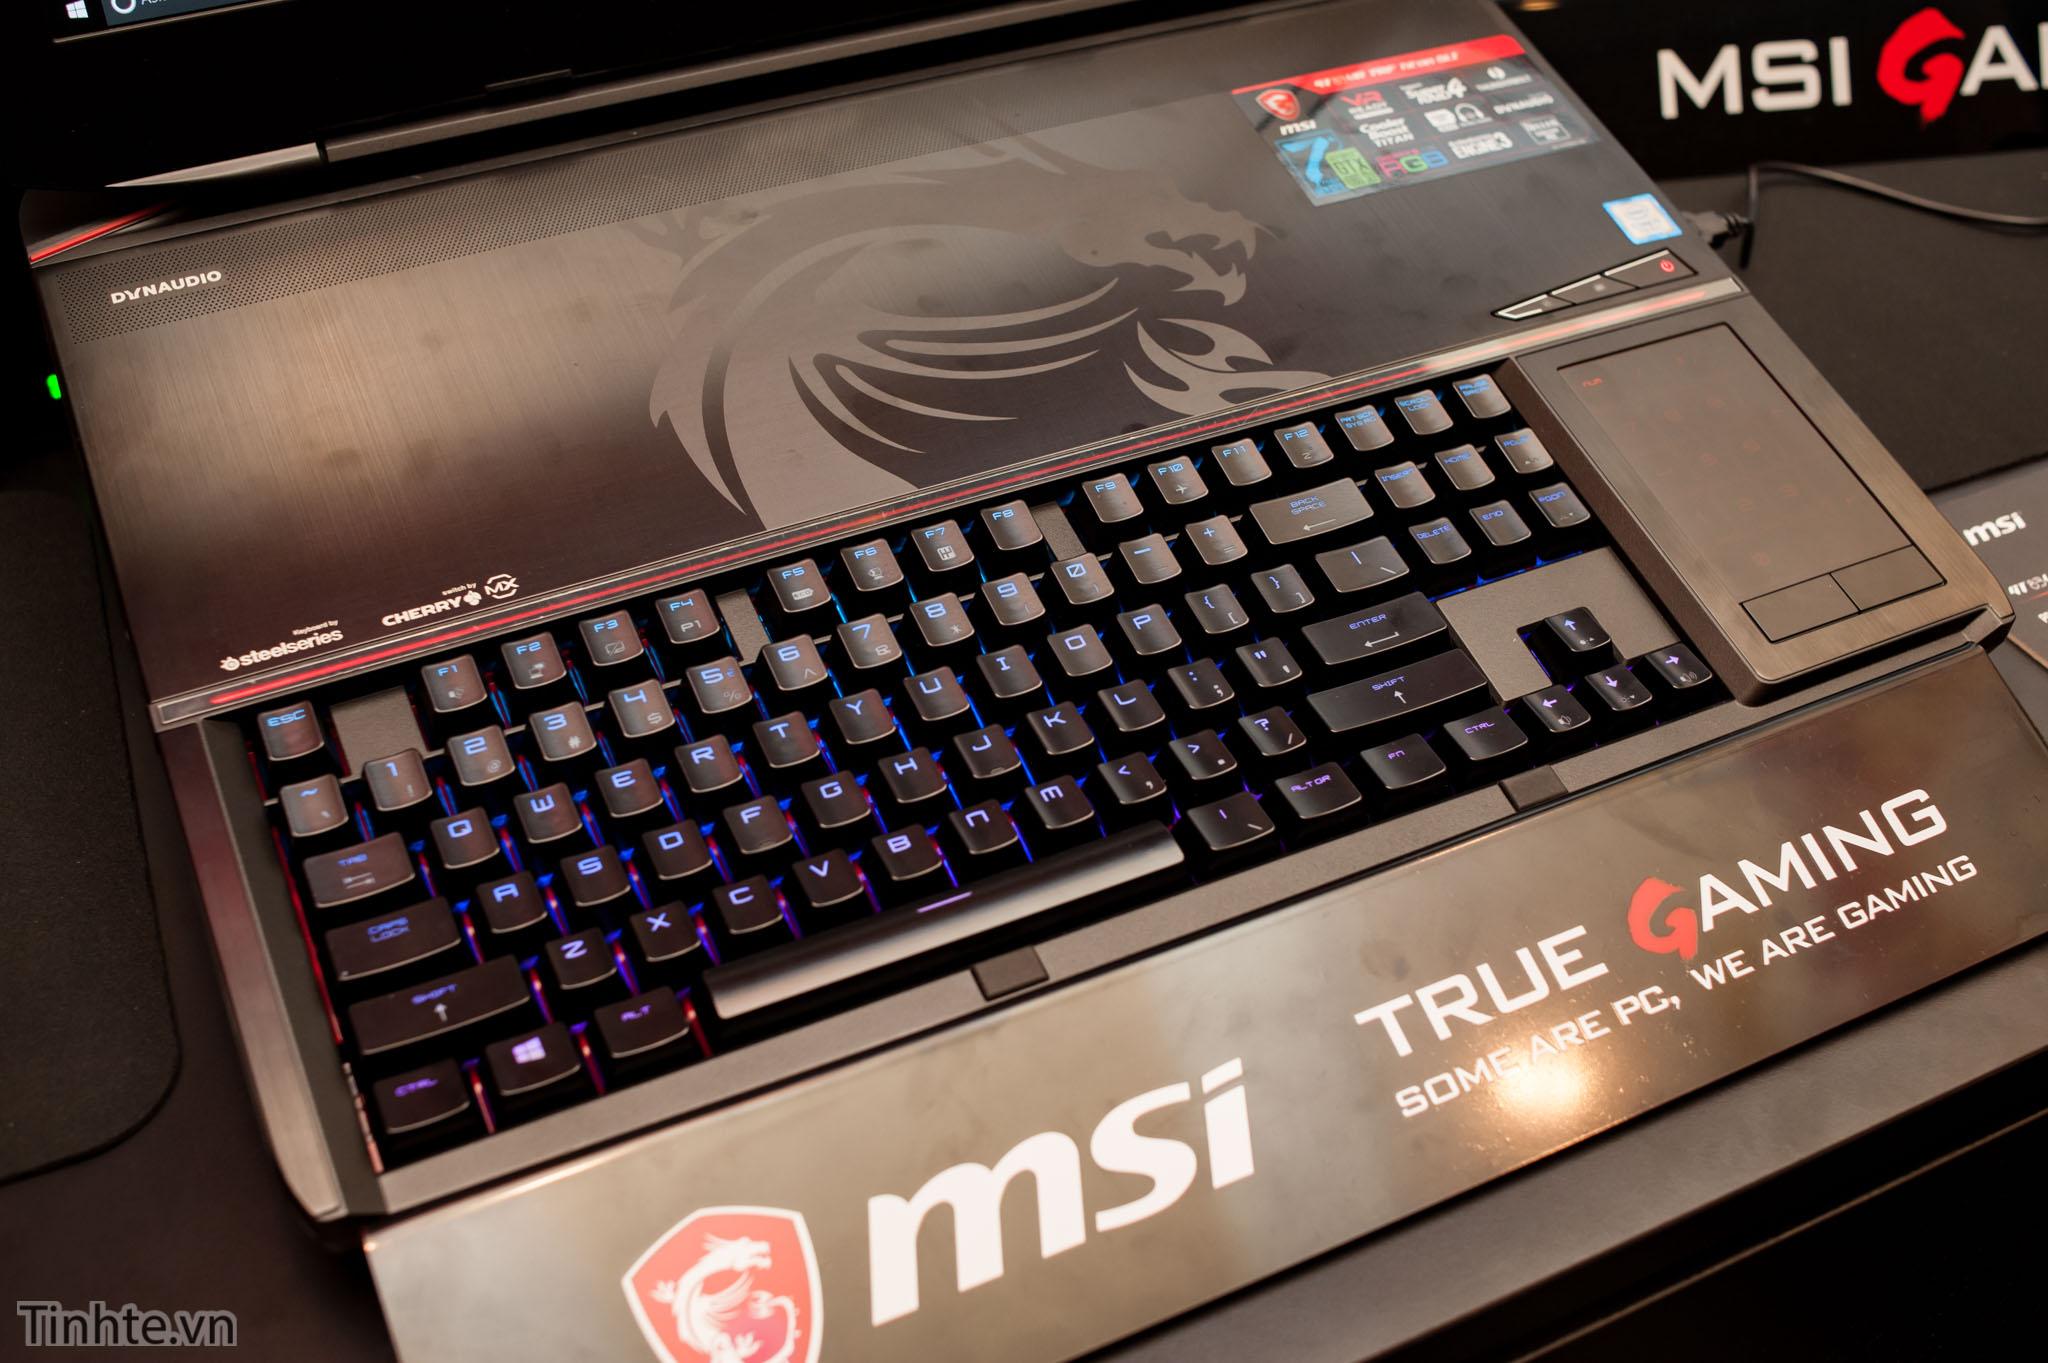 Tinhte.vn_MSI_GT83VR_Titan-9.jpg